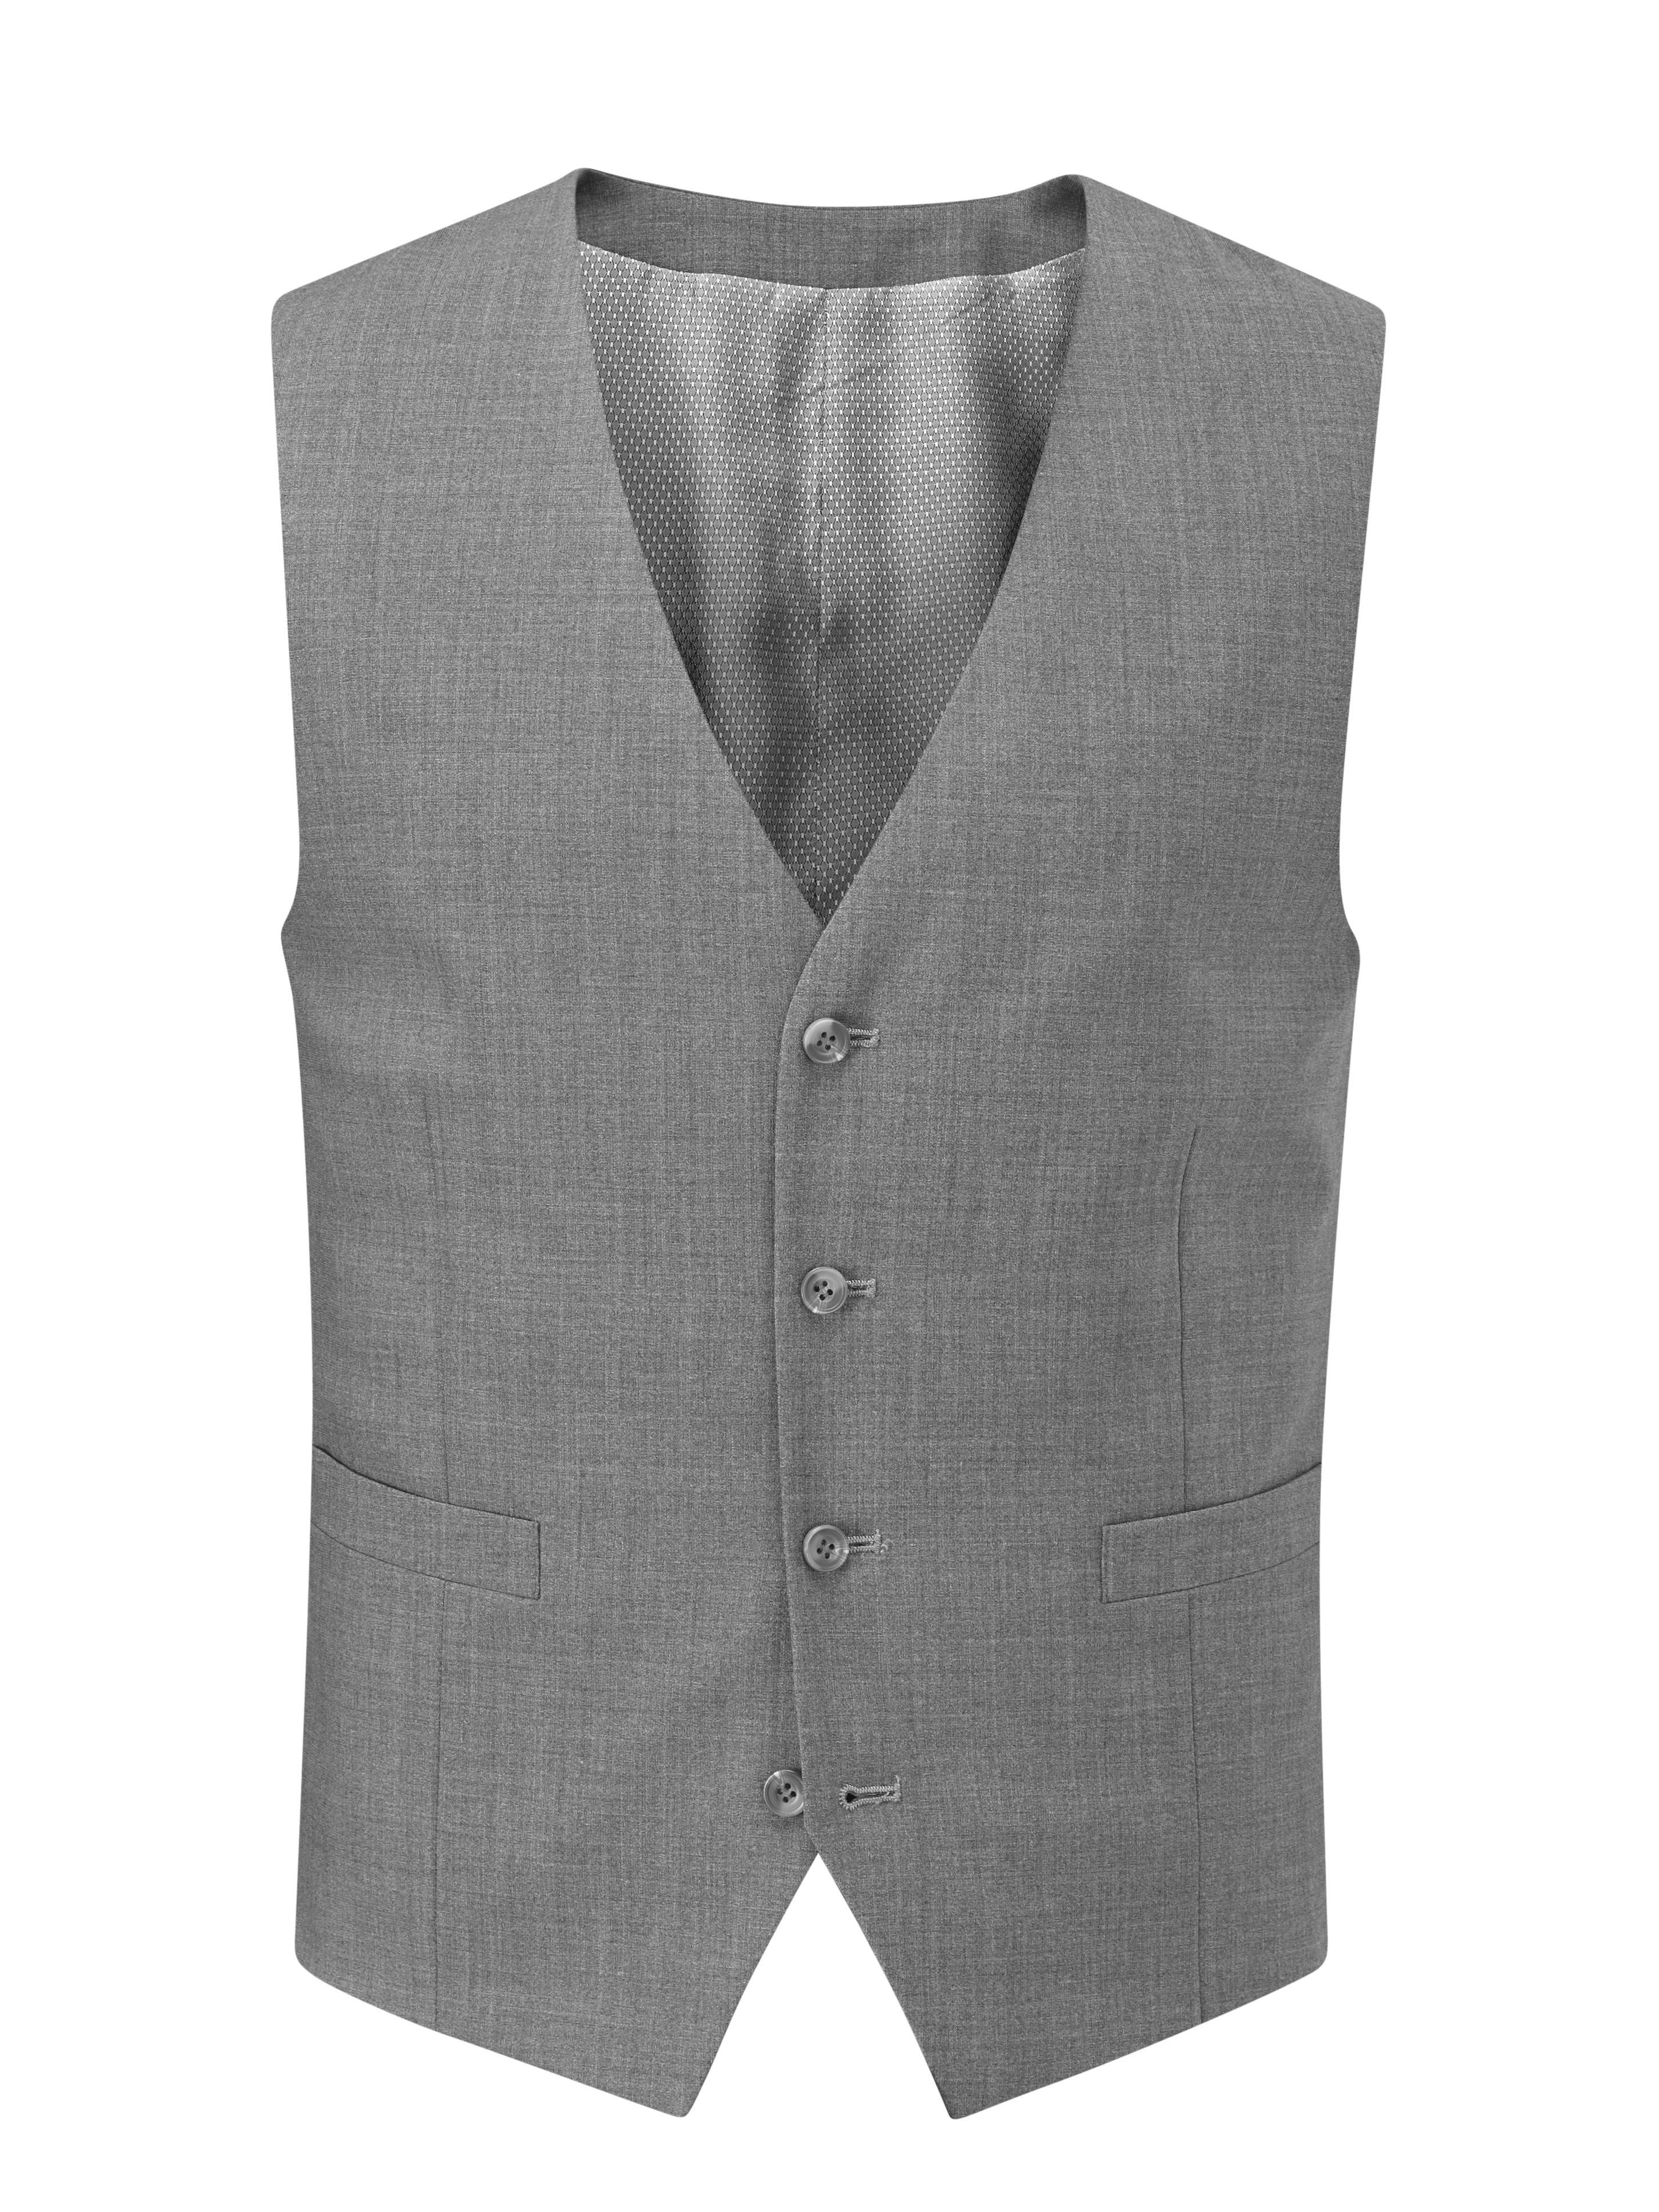 mm1332-darwin-grey-waistcoat-0.jpg